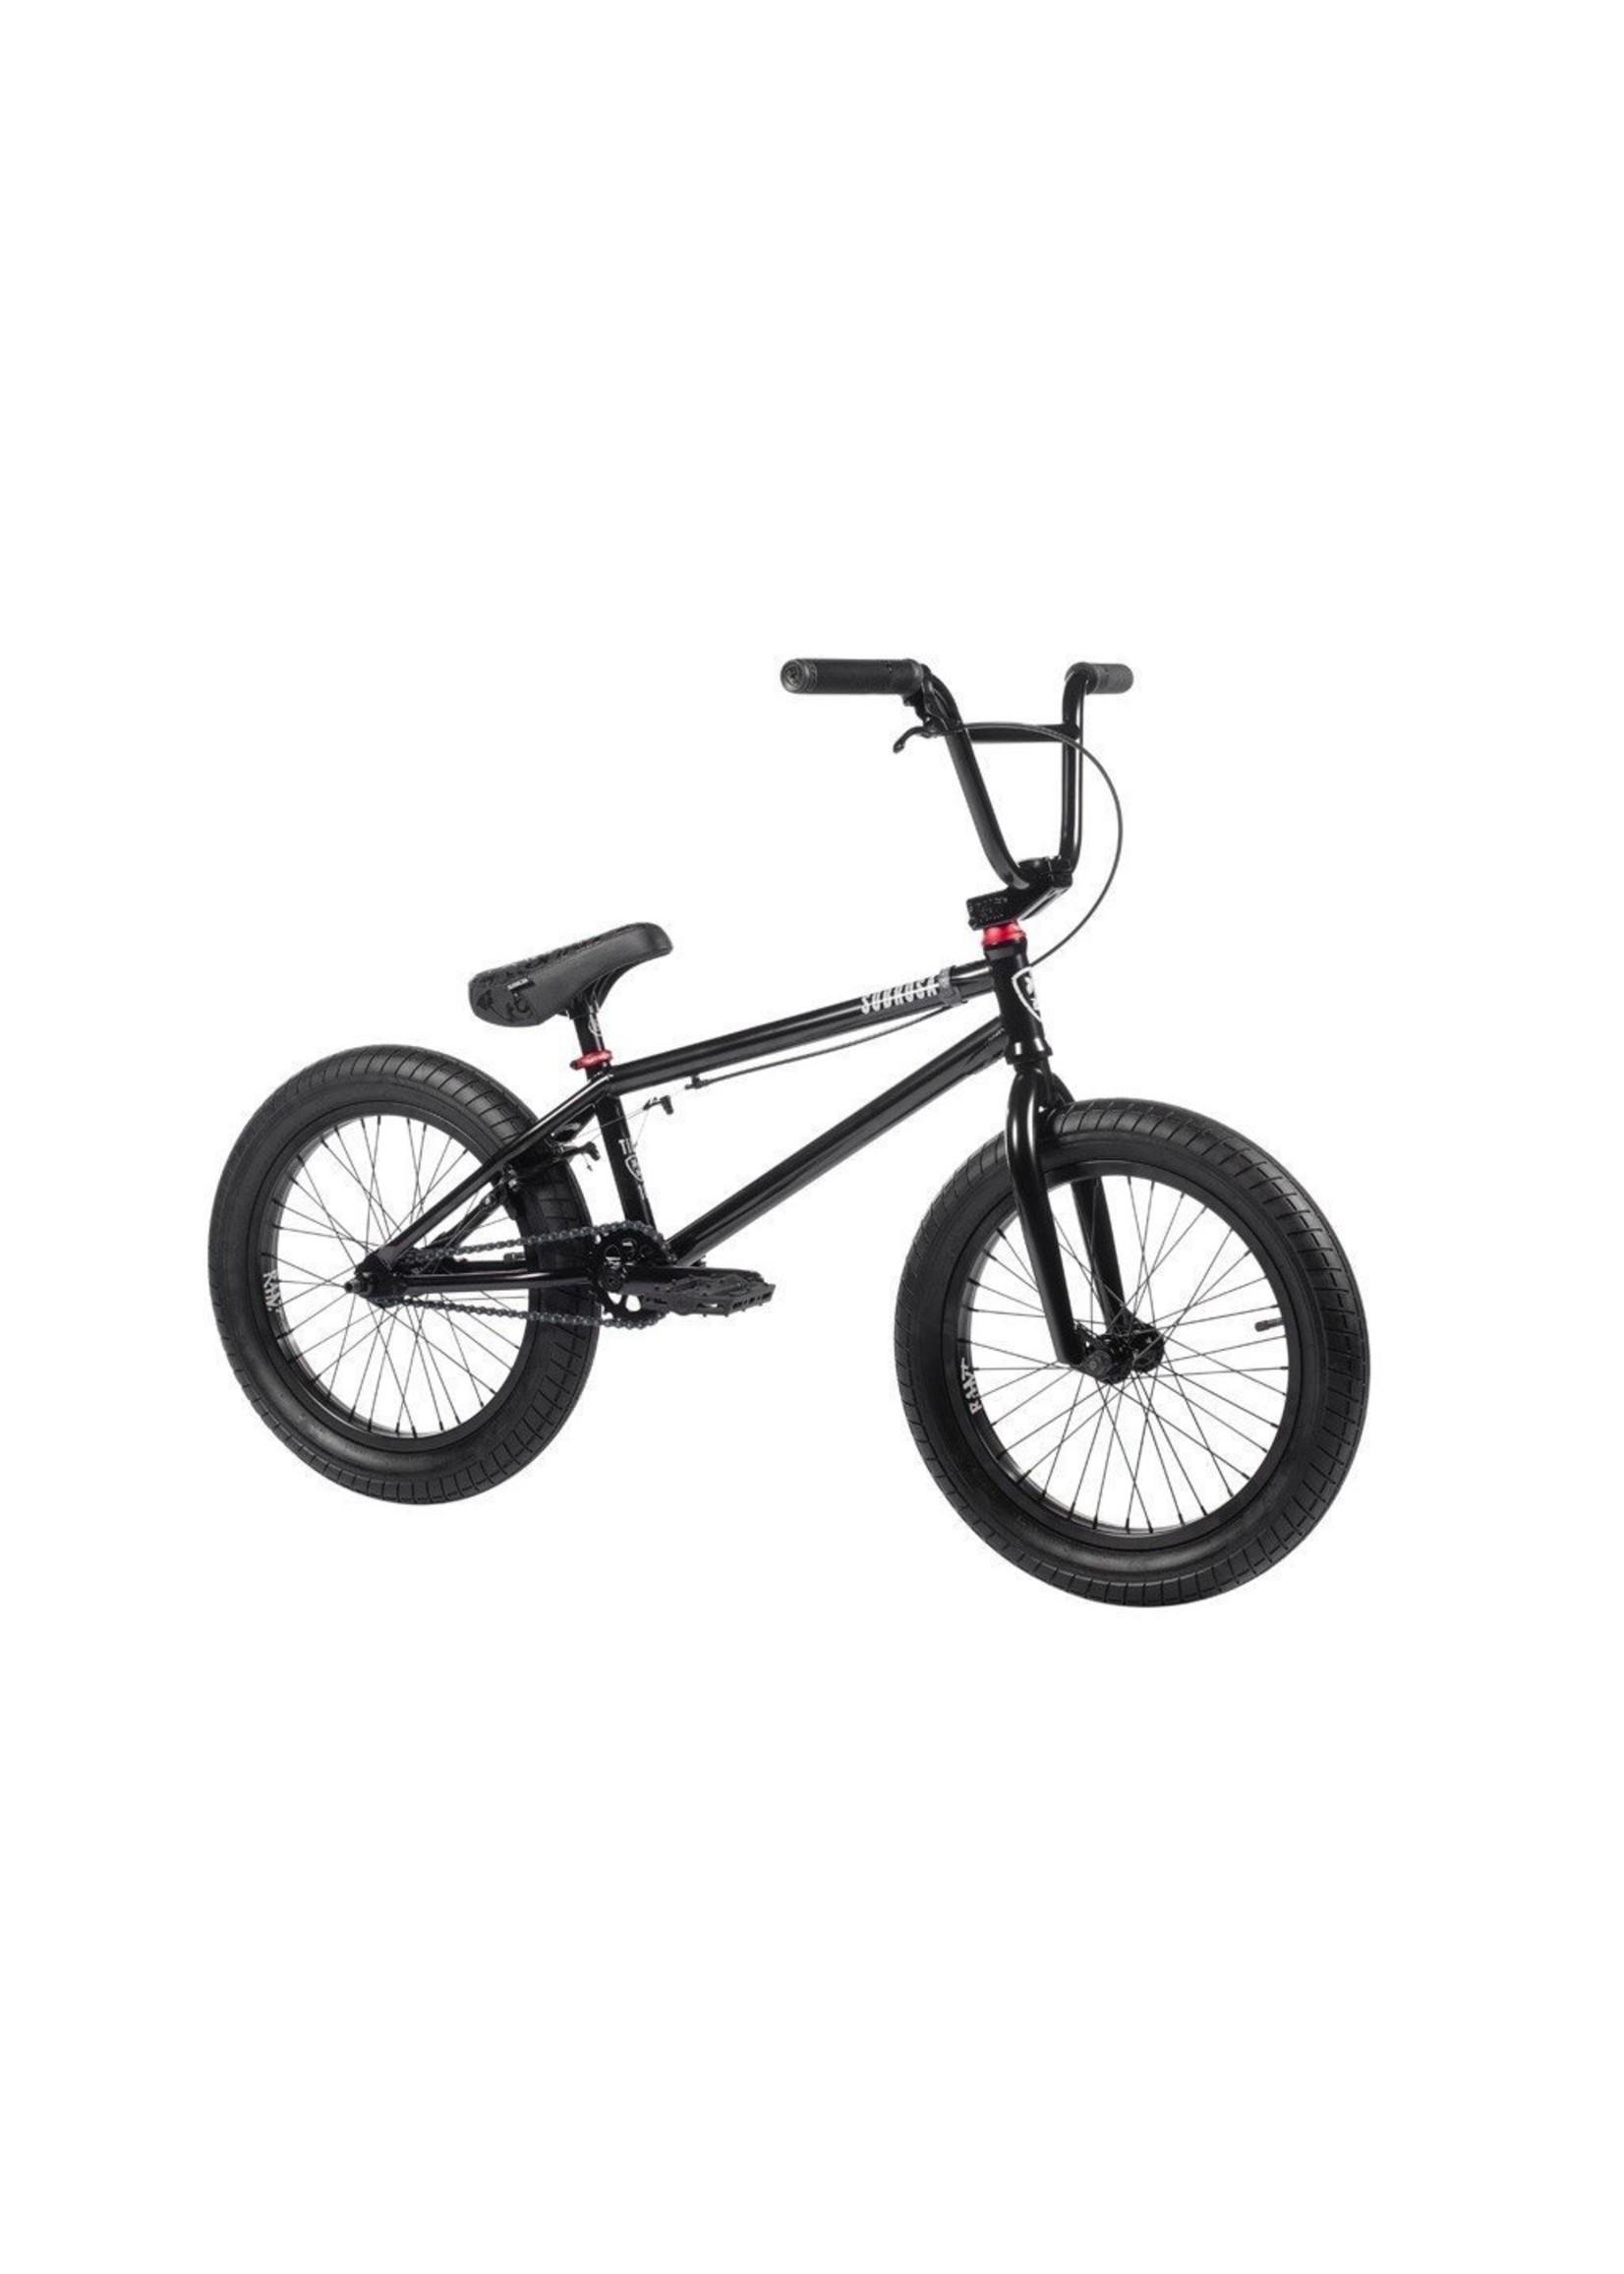 2021 Subrosa Tiro 18'' Complete Bike Black